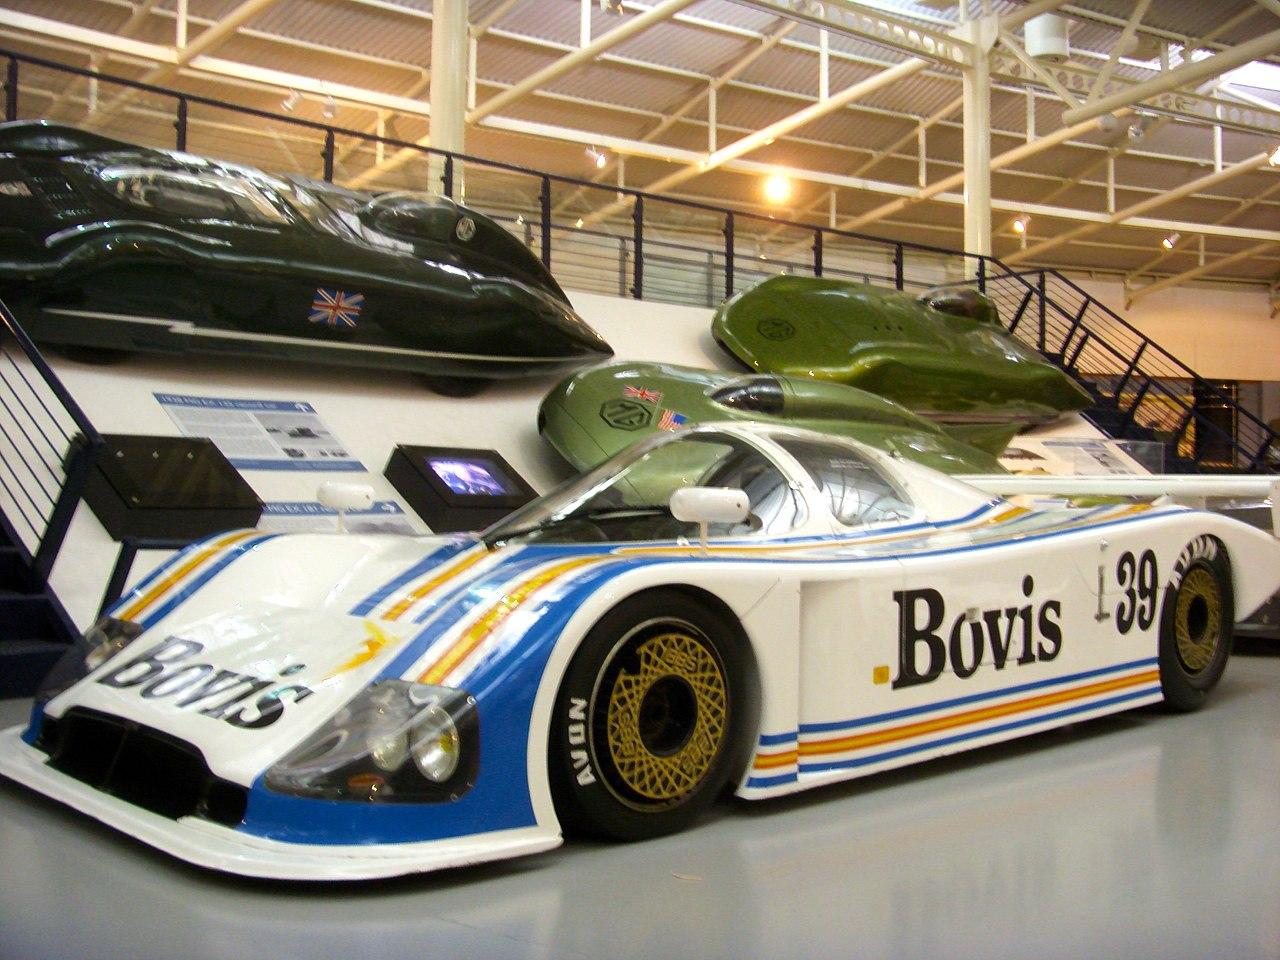 New Ford Car >> File:1982 Aston Martin Nimrod Group C Race Car Heritage Motor Centre, Gaydon.jpg - Wikimedia Commons